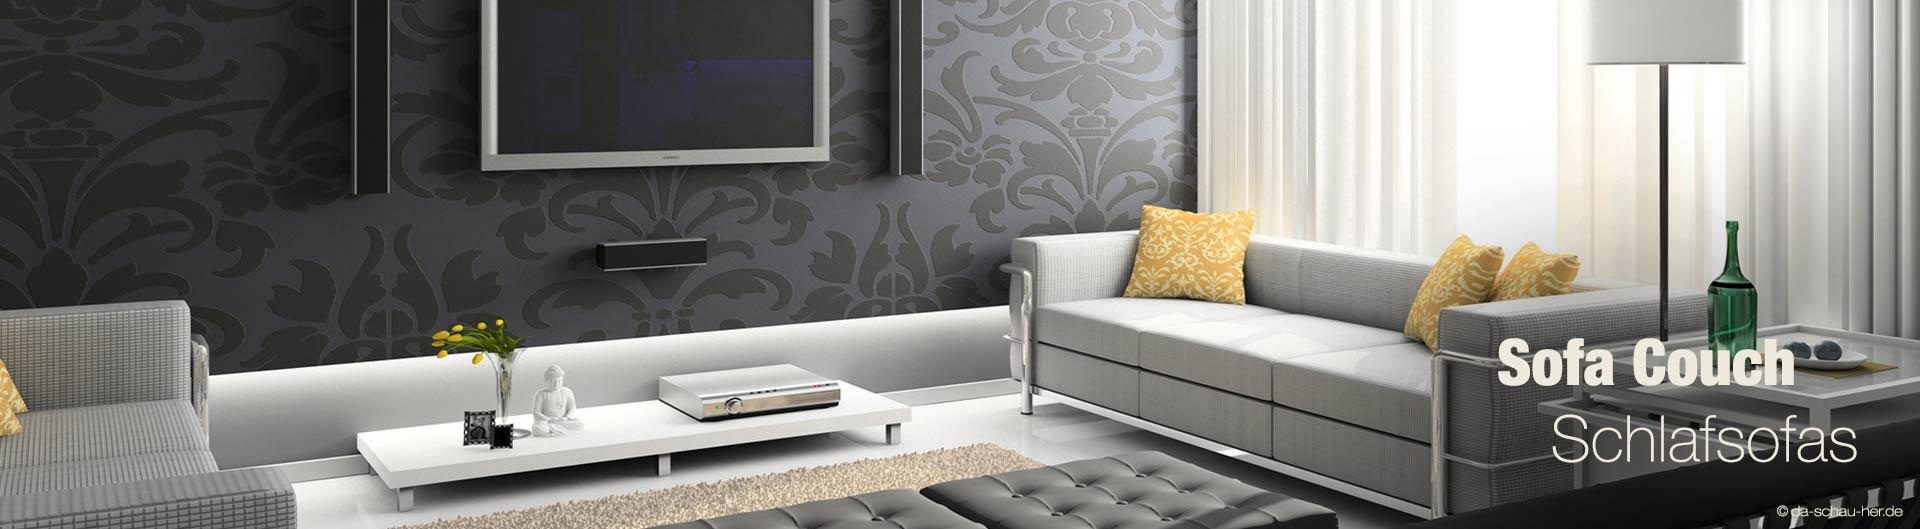 sofa munchen couch da schau her de